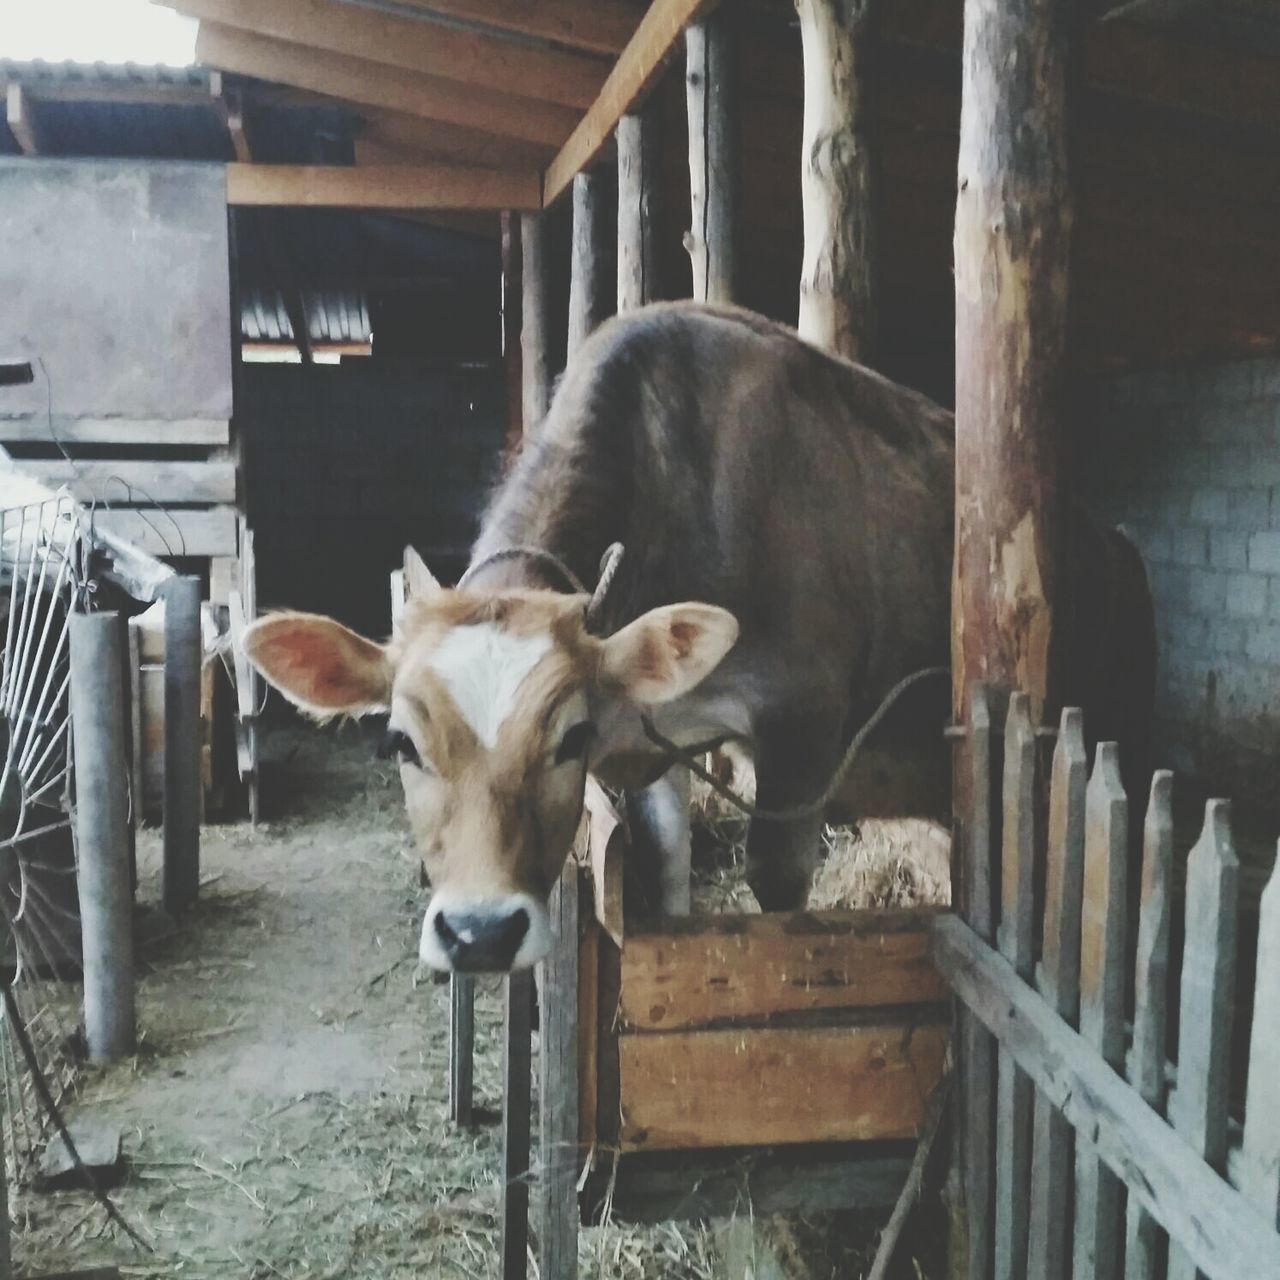 Cows Animals Farm Farm Life